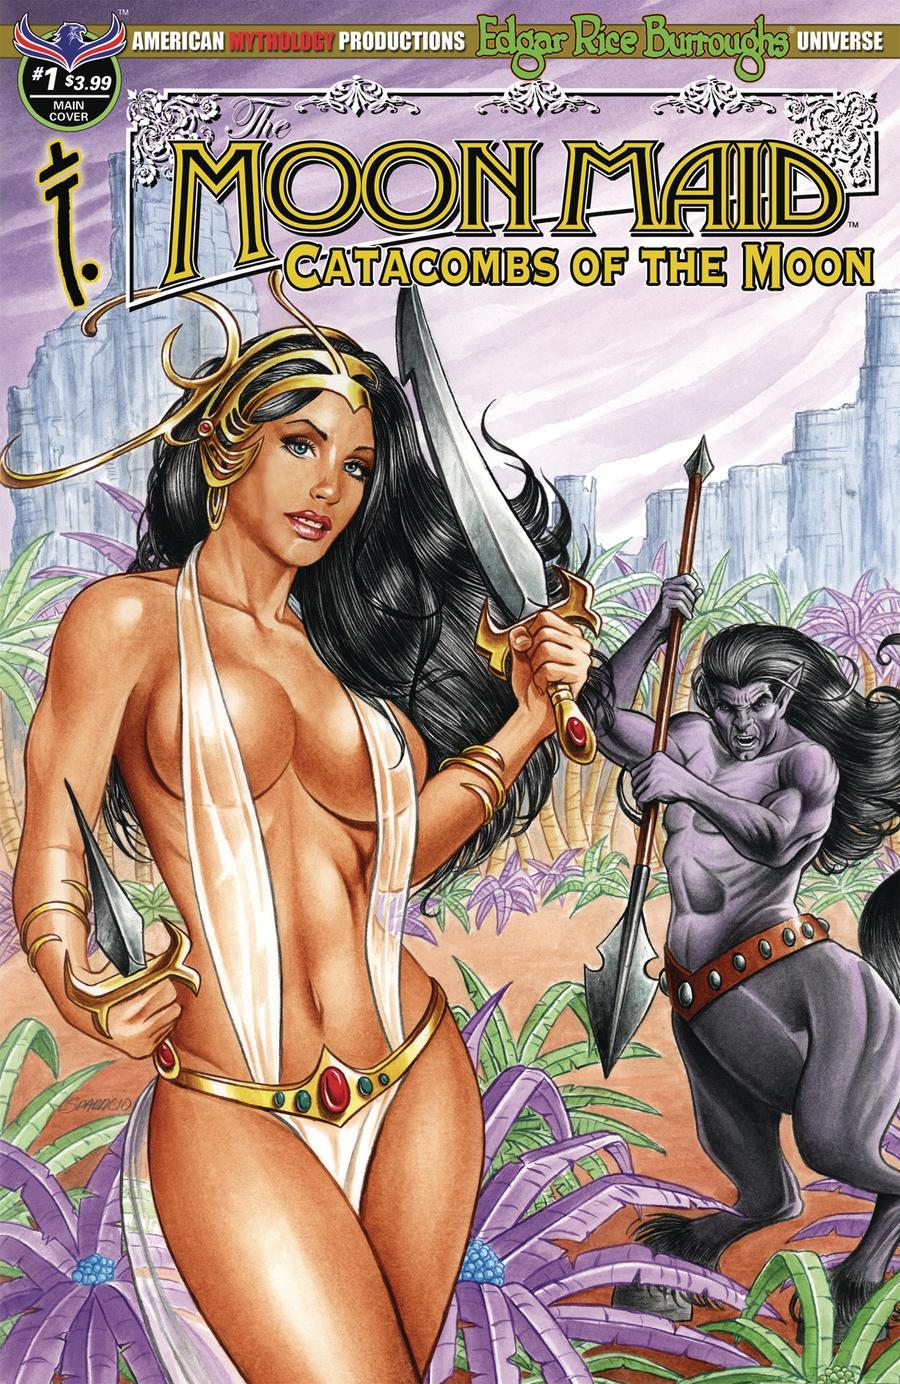 Moon Maid Catacombs Of The Moon #1 Cover A Regular Mark Sparacio Cover